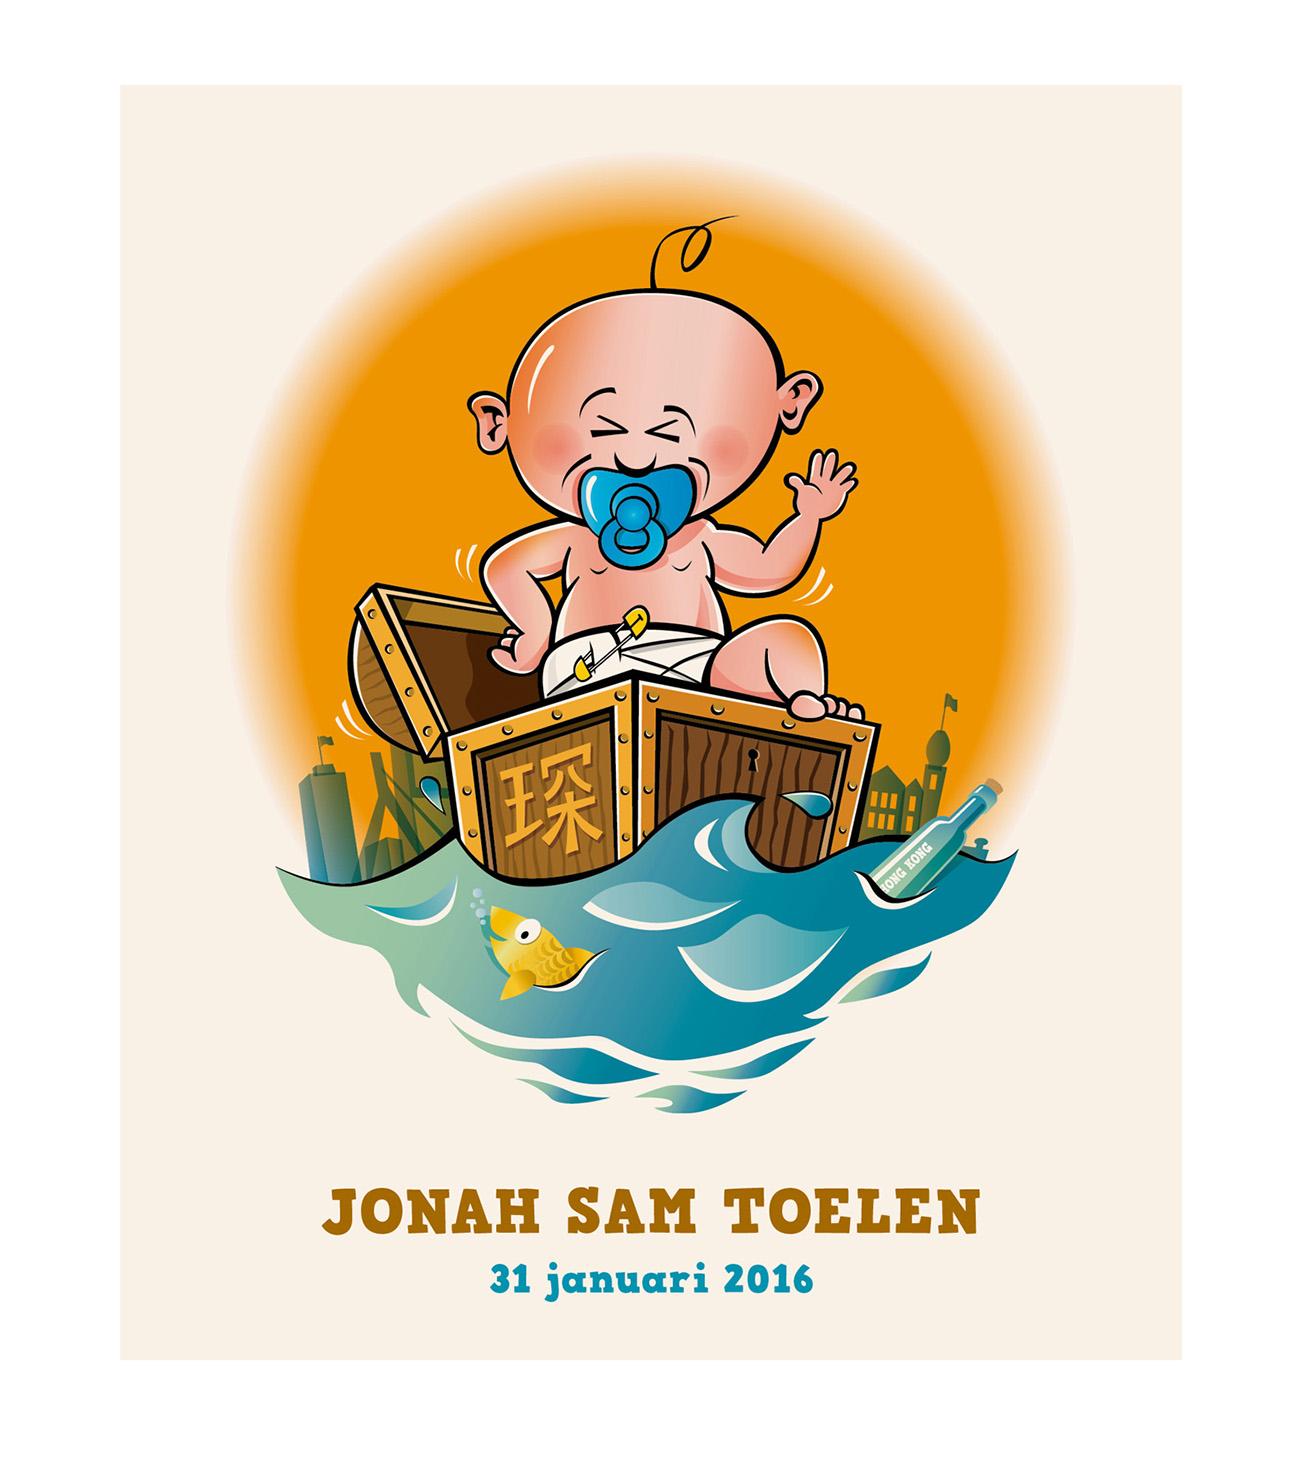 Geboortekaartje_Jonah_Sam_1